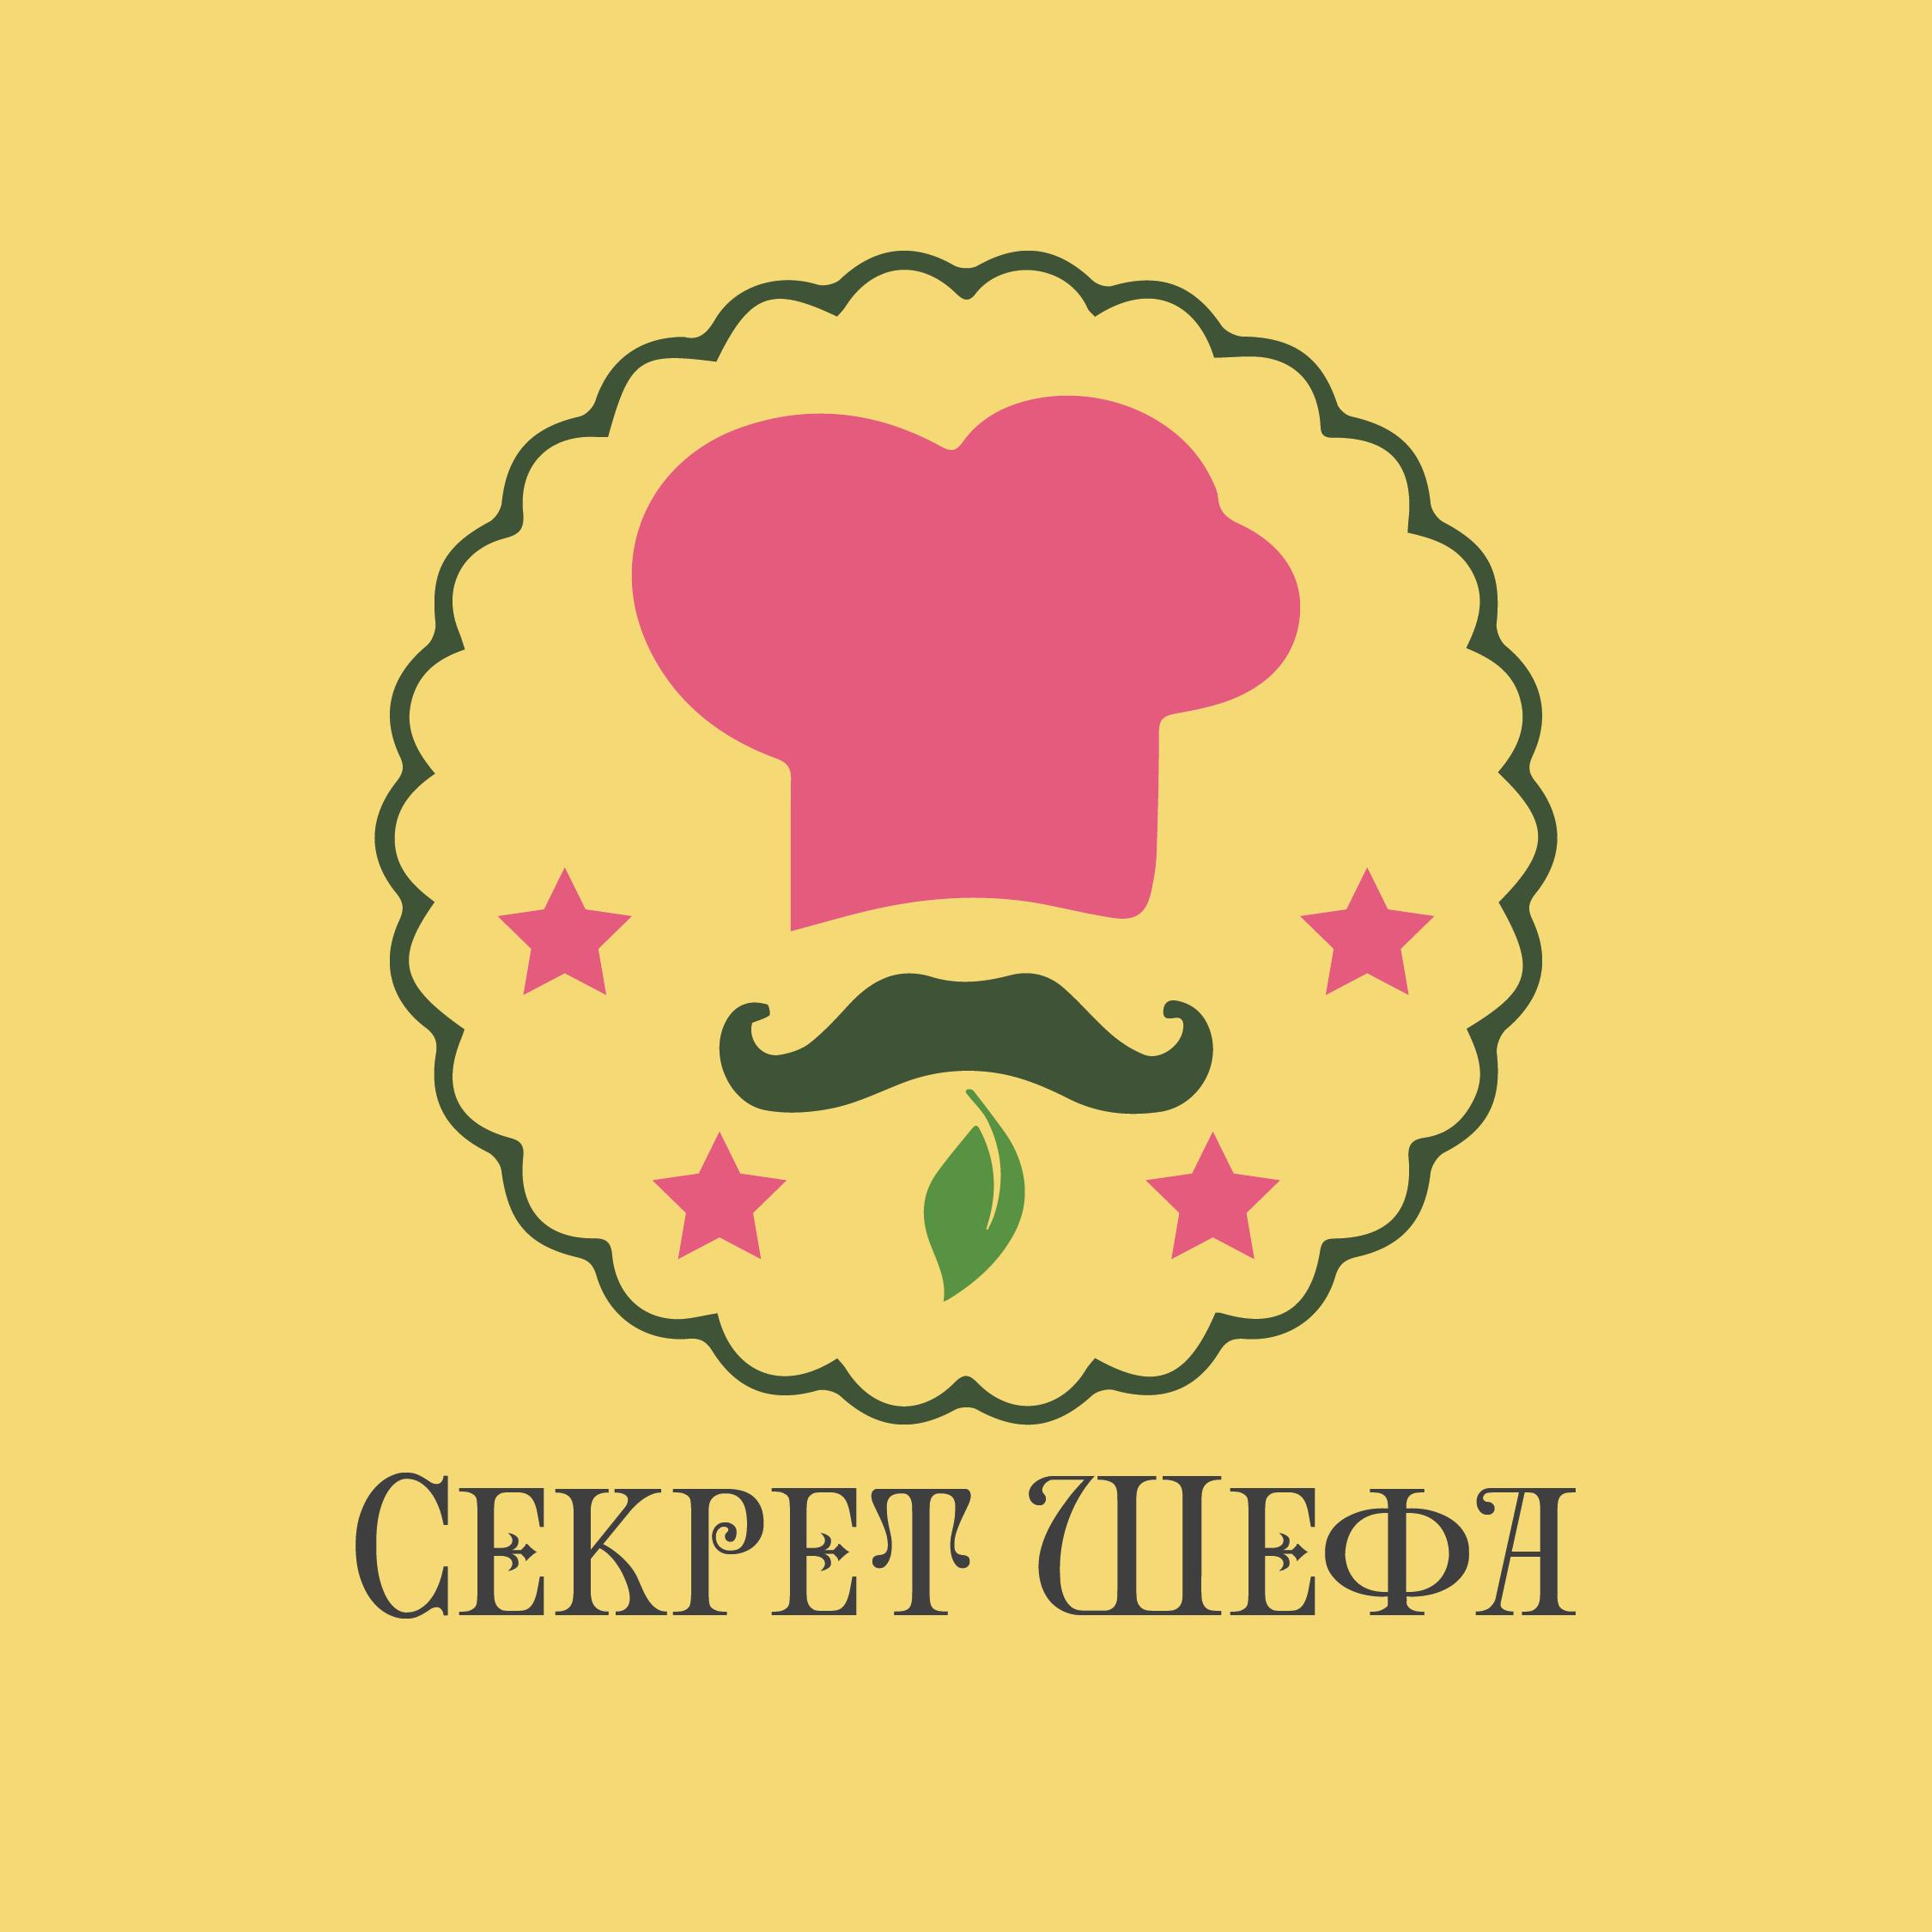 Логотип для марки специй и приправ Секрет Шефа фото f_8805f3e329de24ec.png